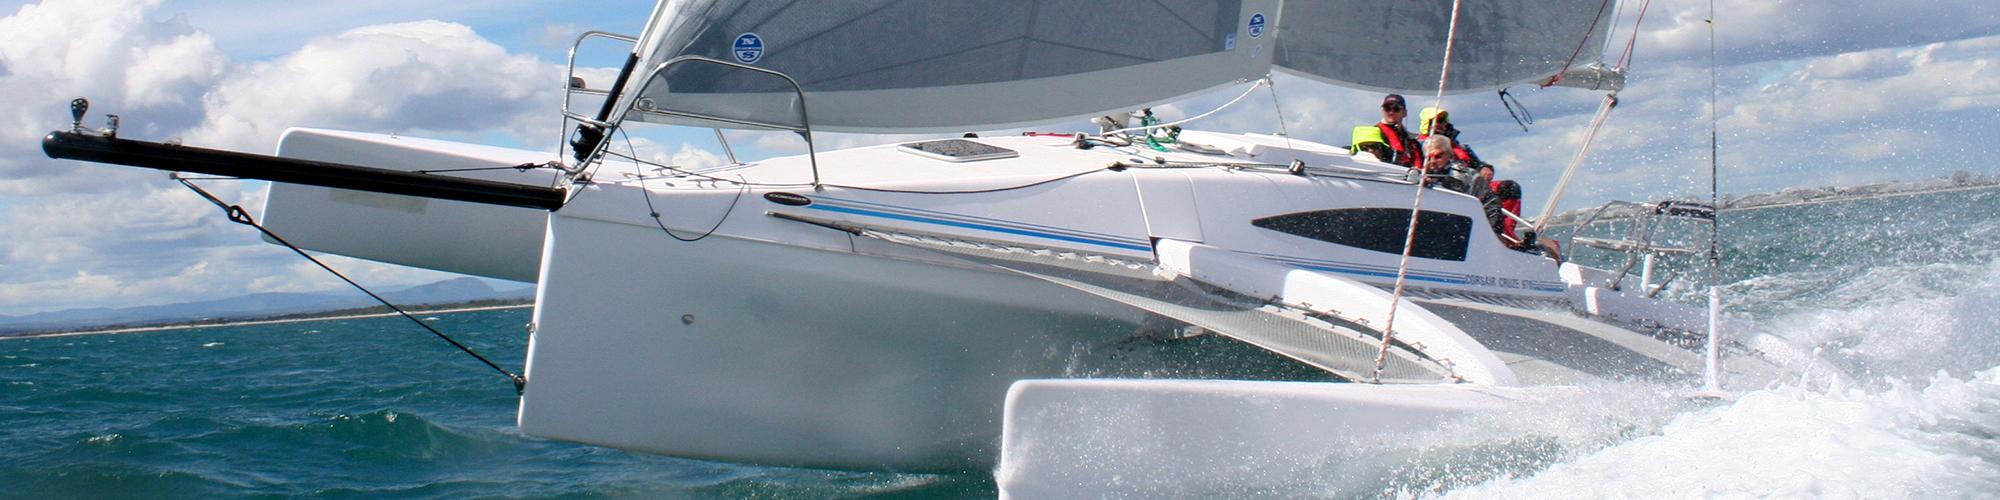 corsair Cruze 970 trimaran sailboat